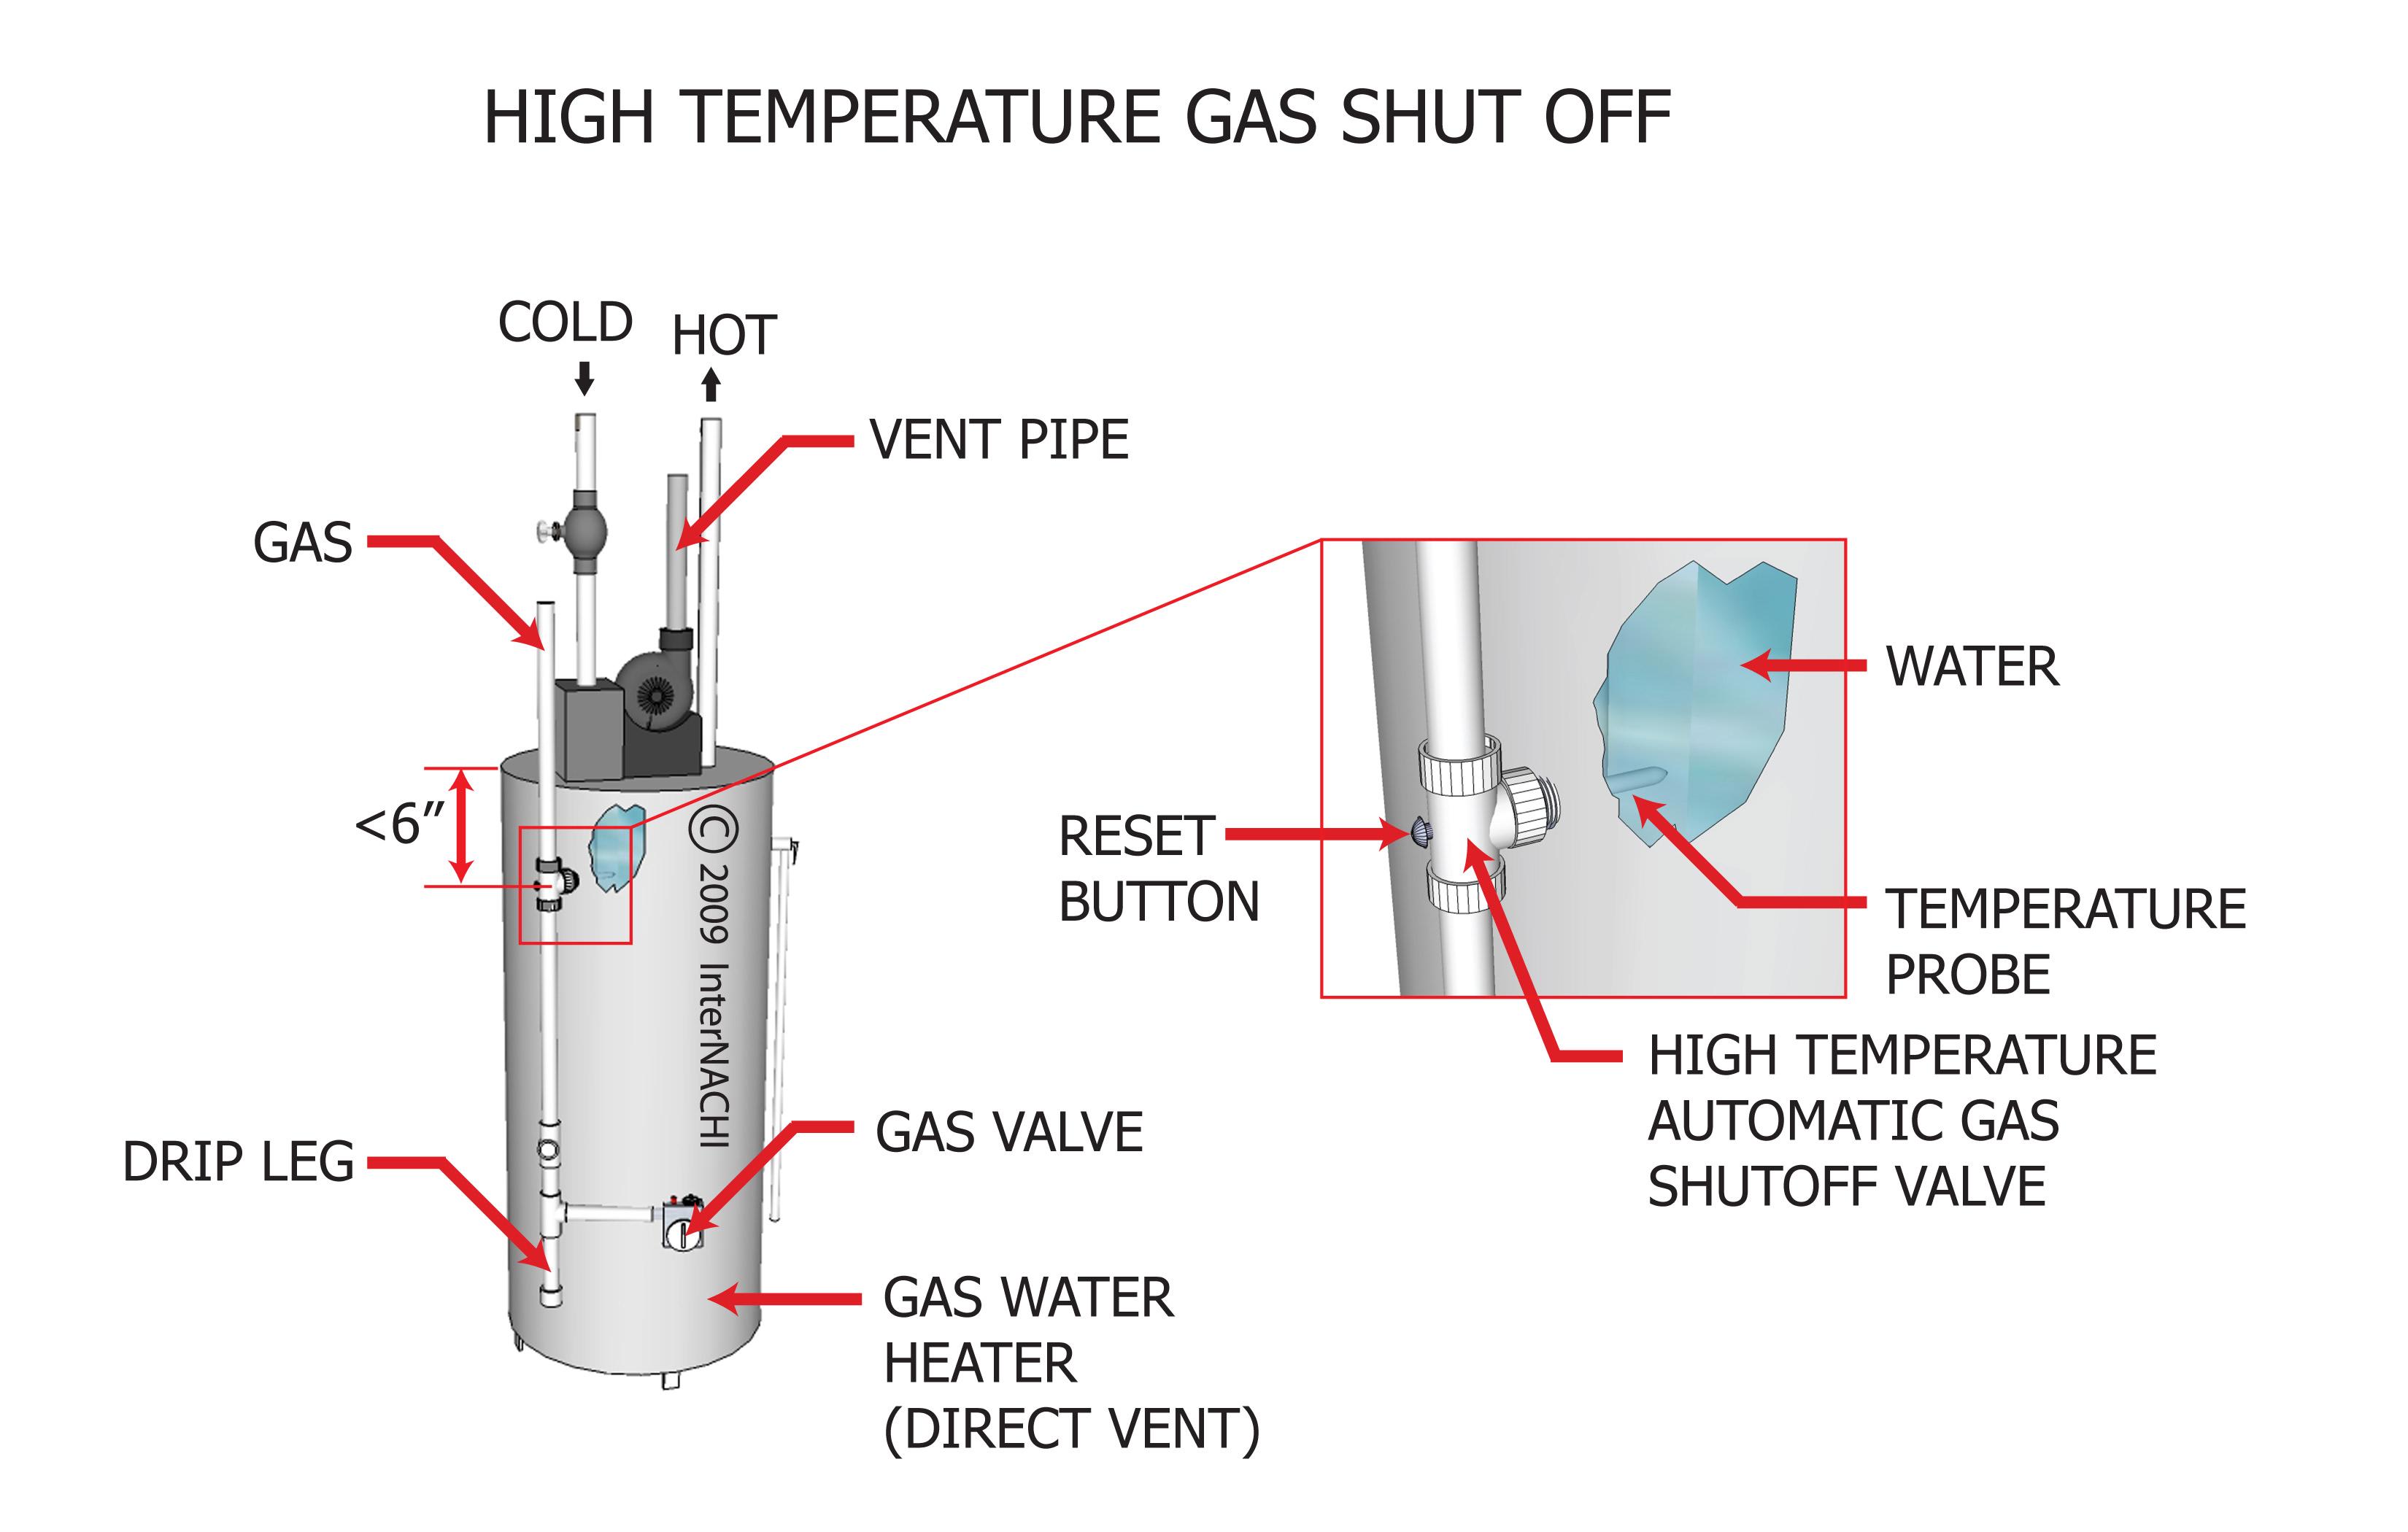 High temperature gas shut off.